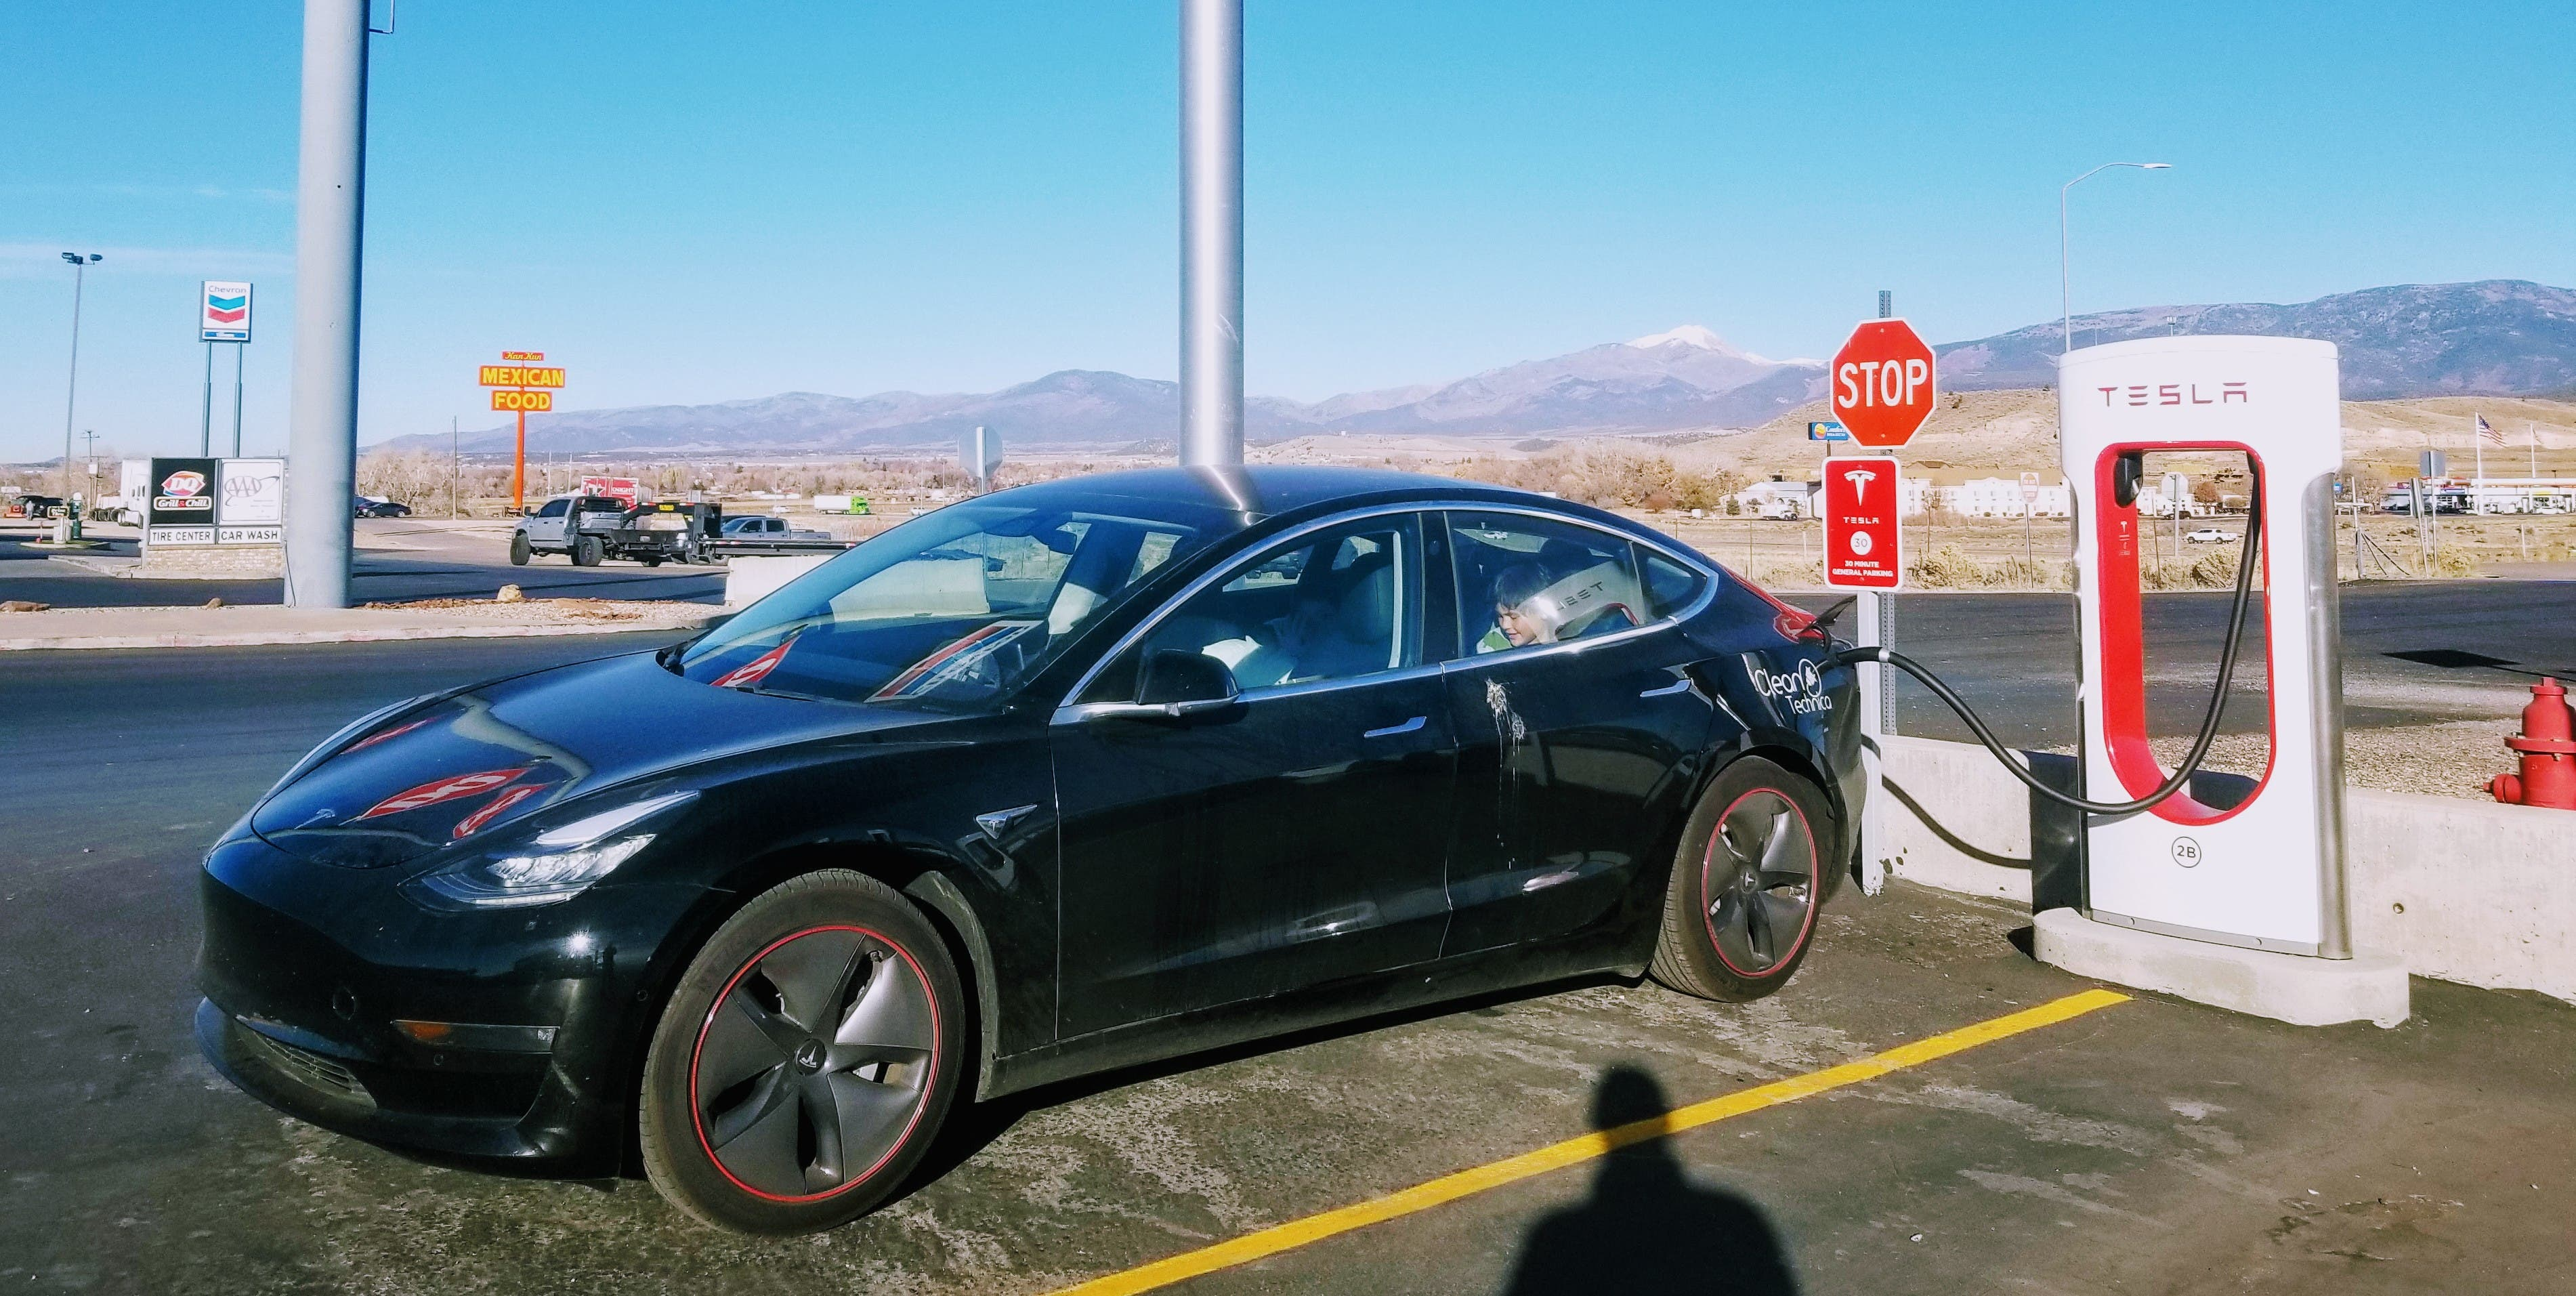 How Tesla Model 3 Compares To Tesla Model S On 2,400 Mile